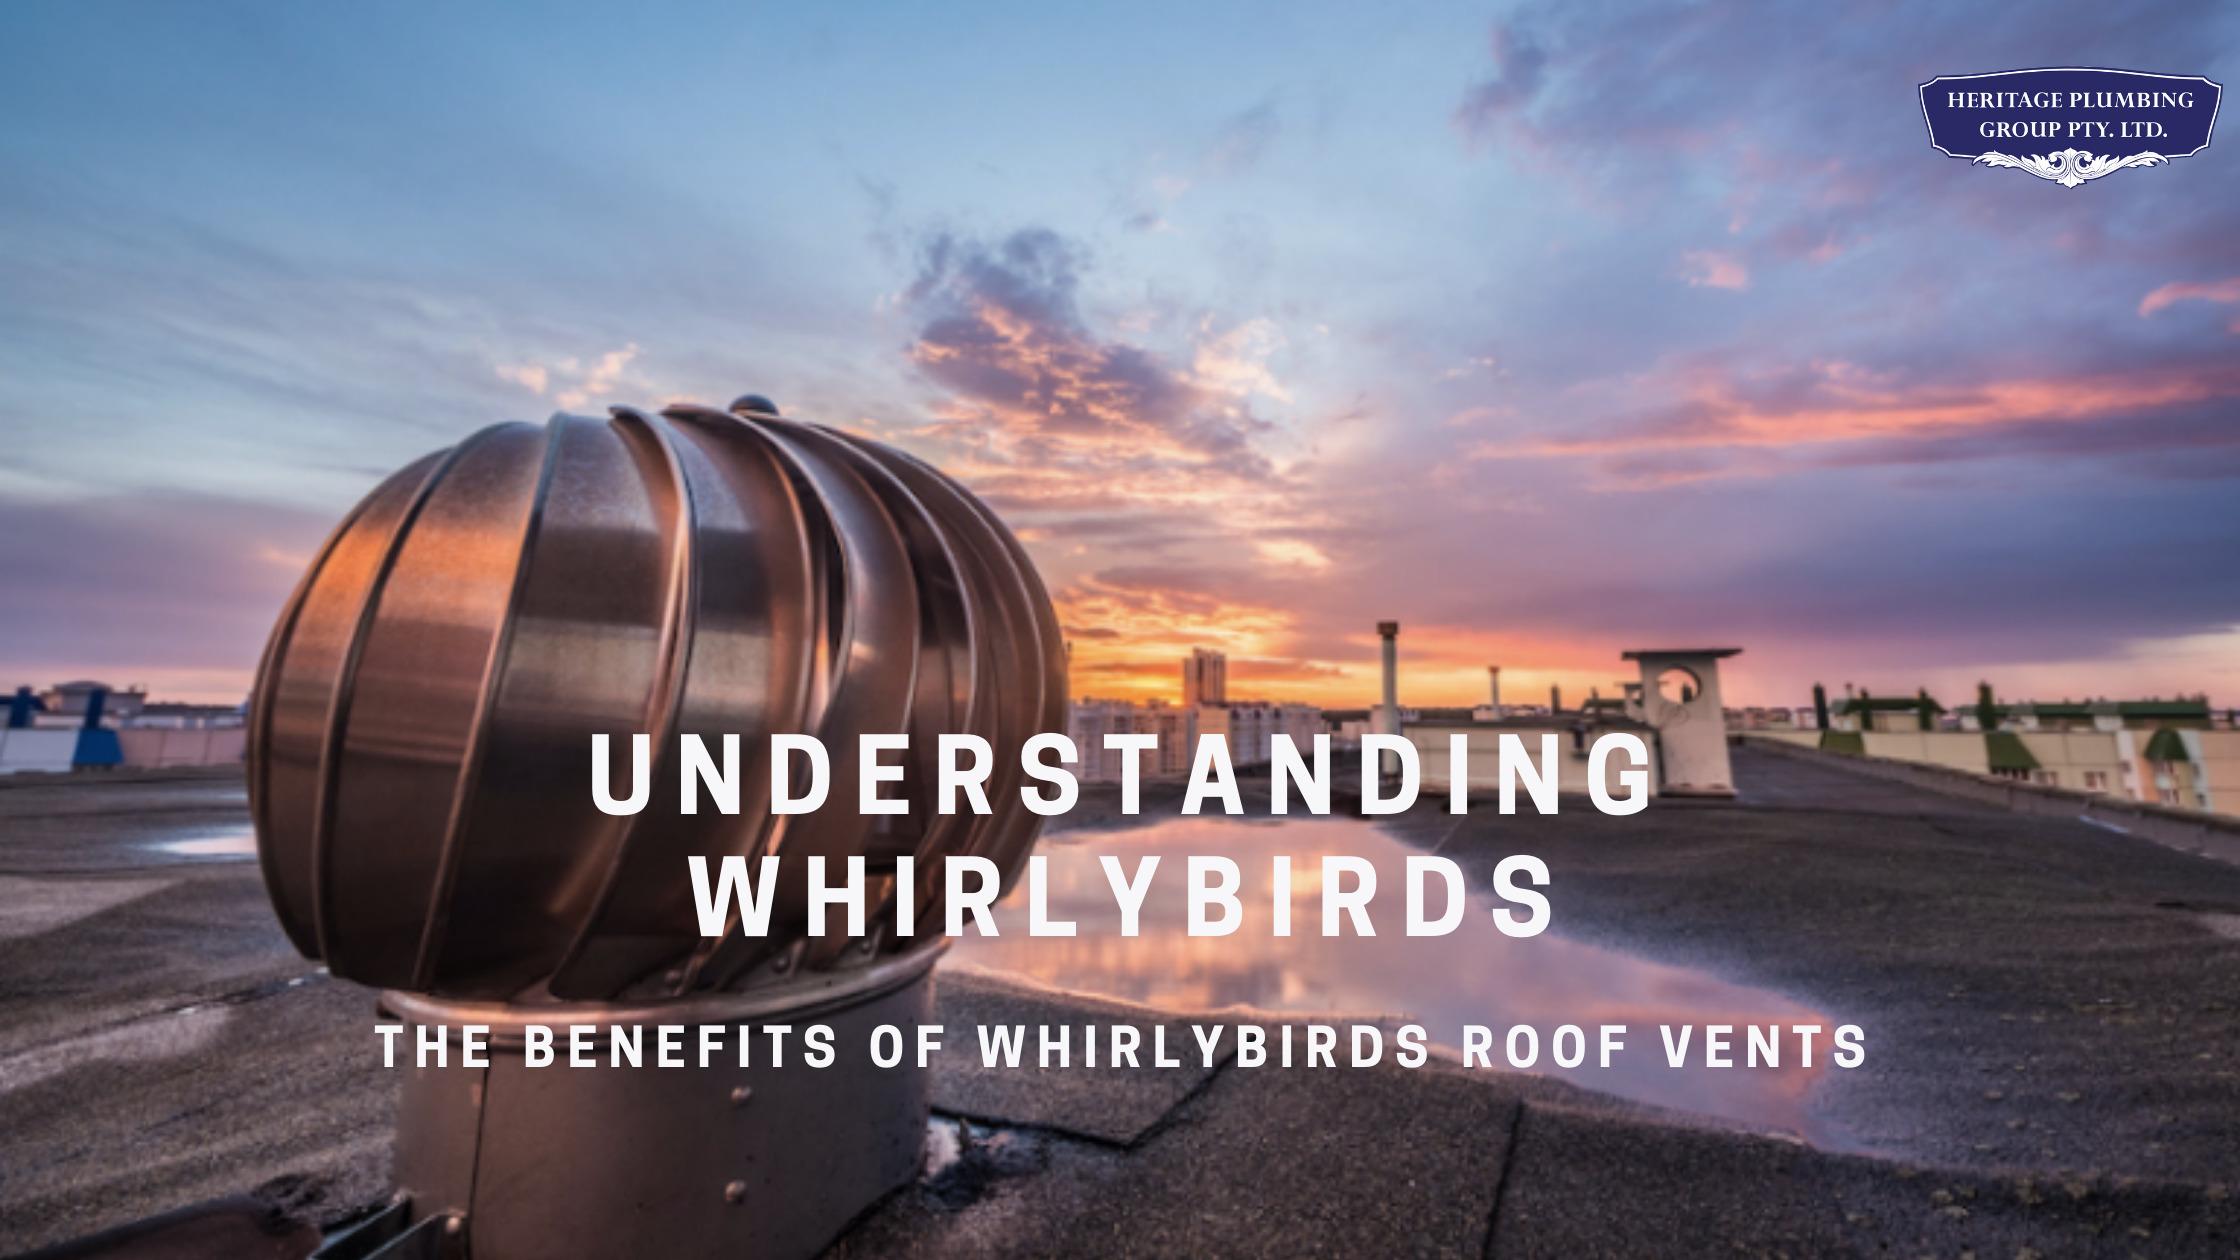 whirlybirds benefits